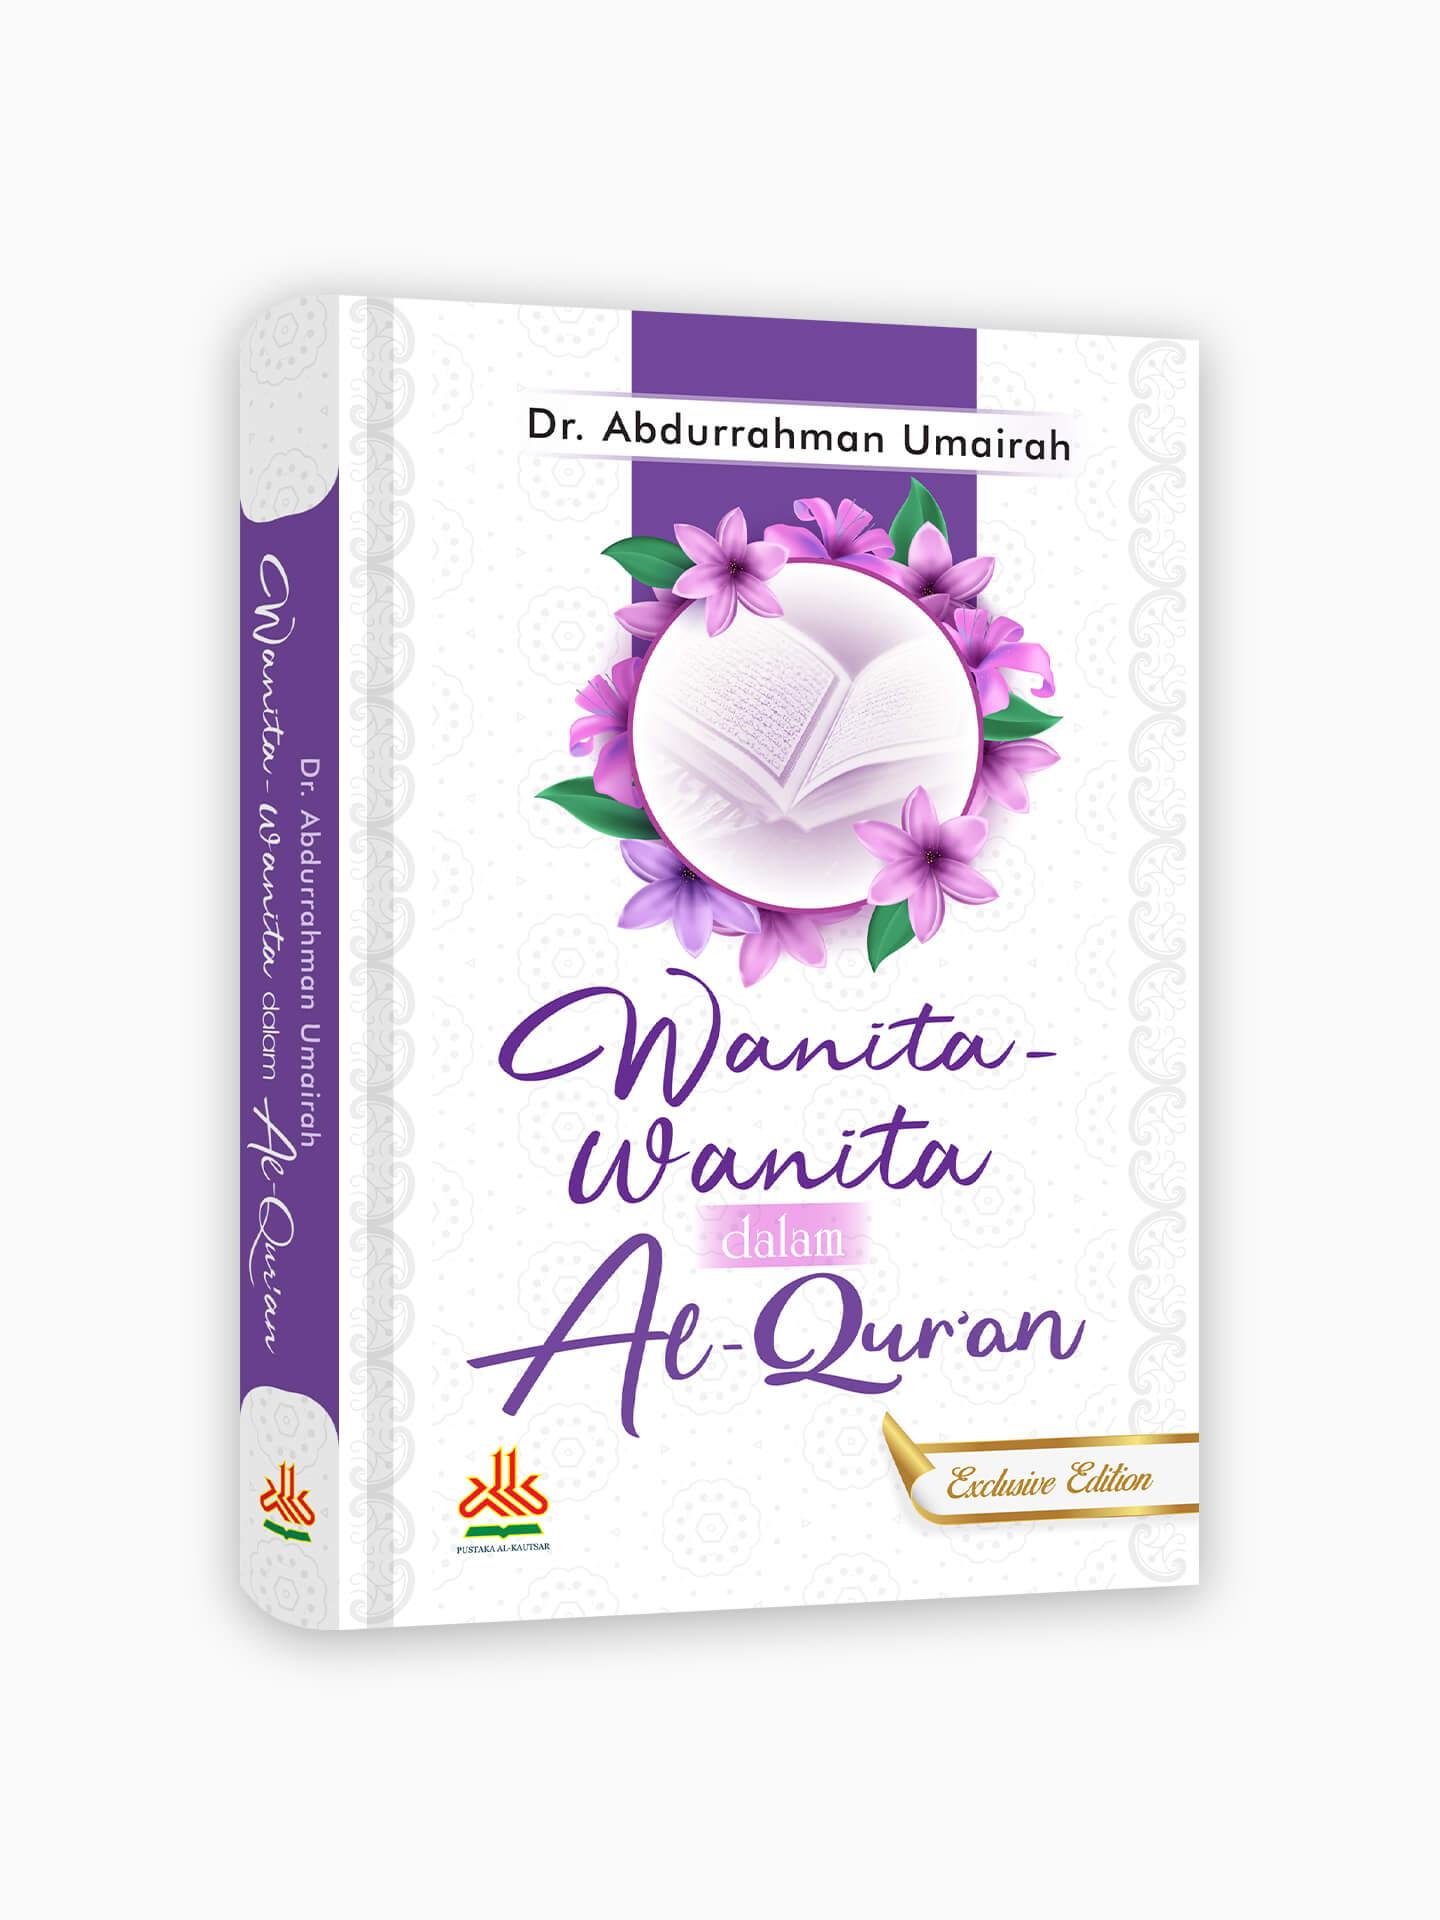 Wanita-Wanita dalam Al-Qur'an